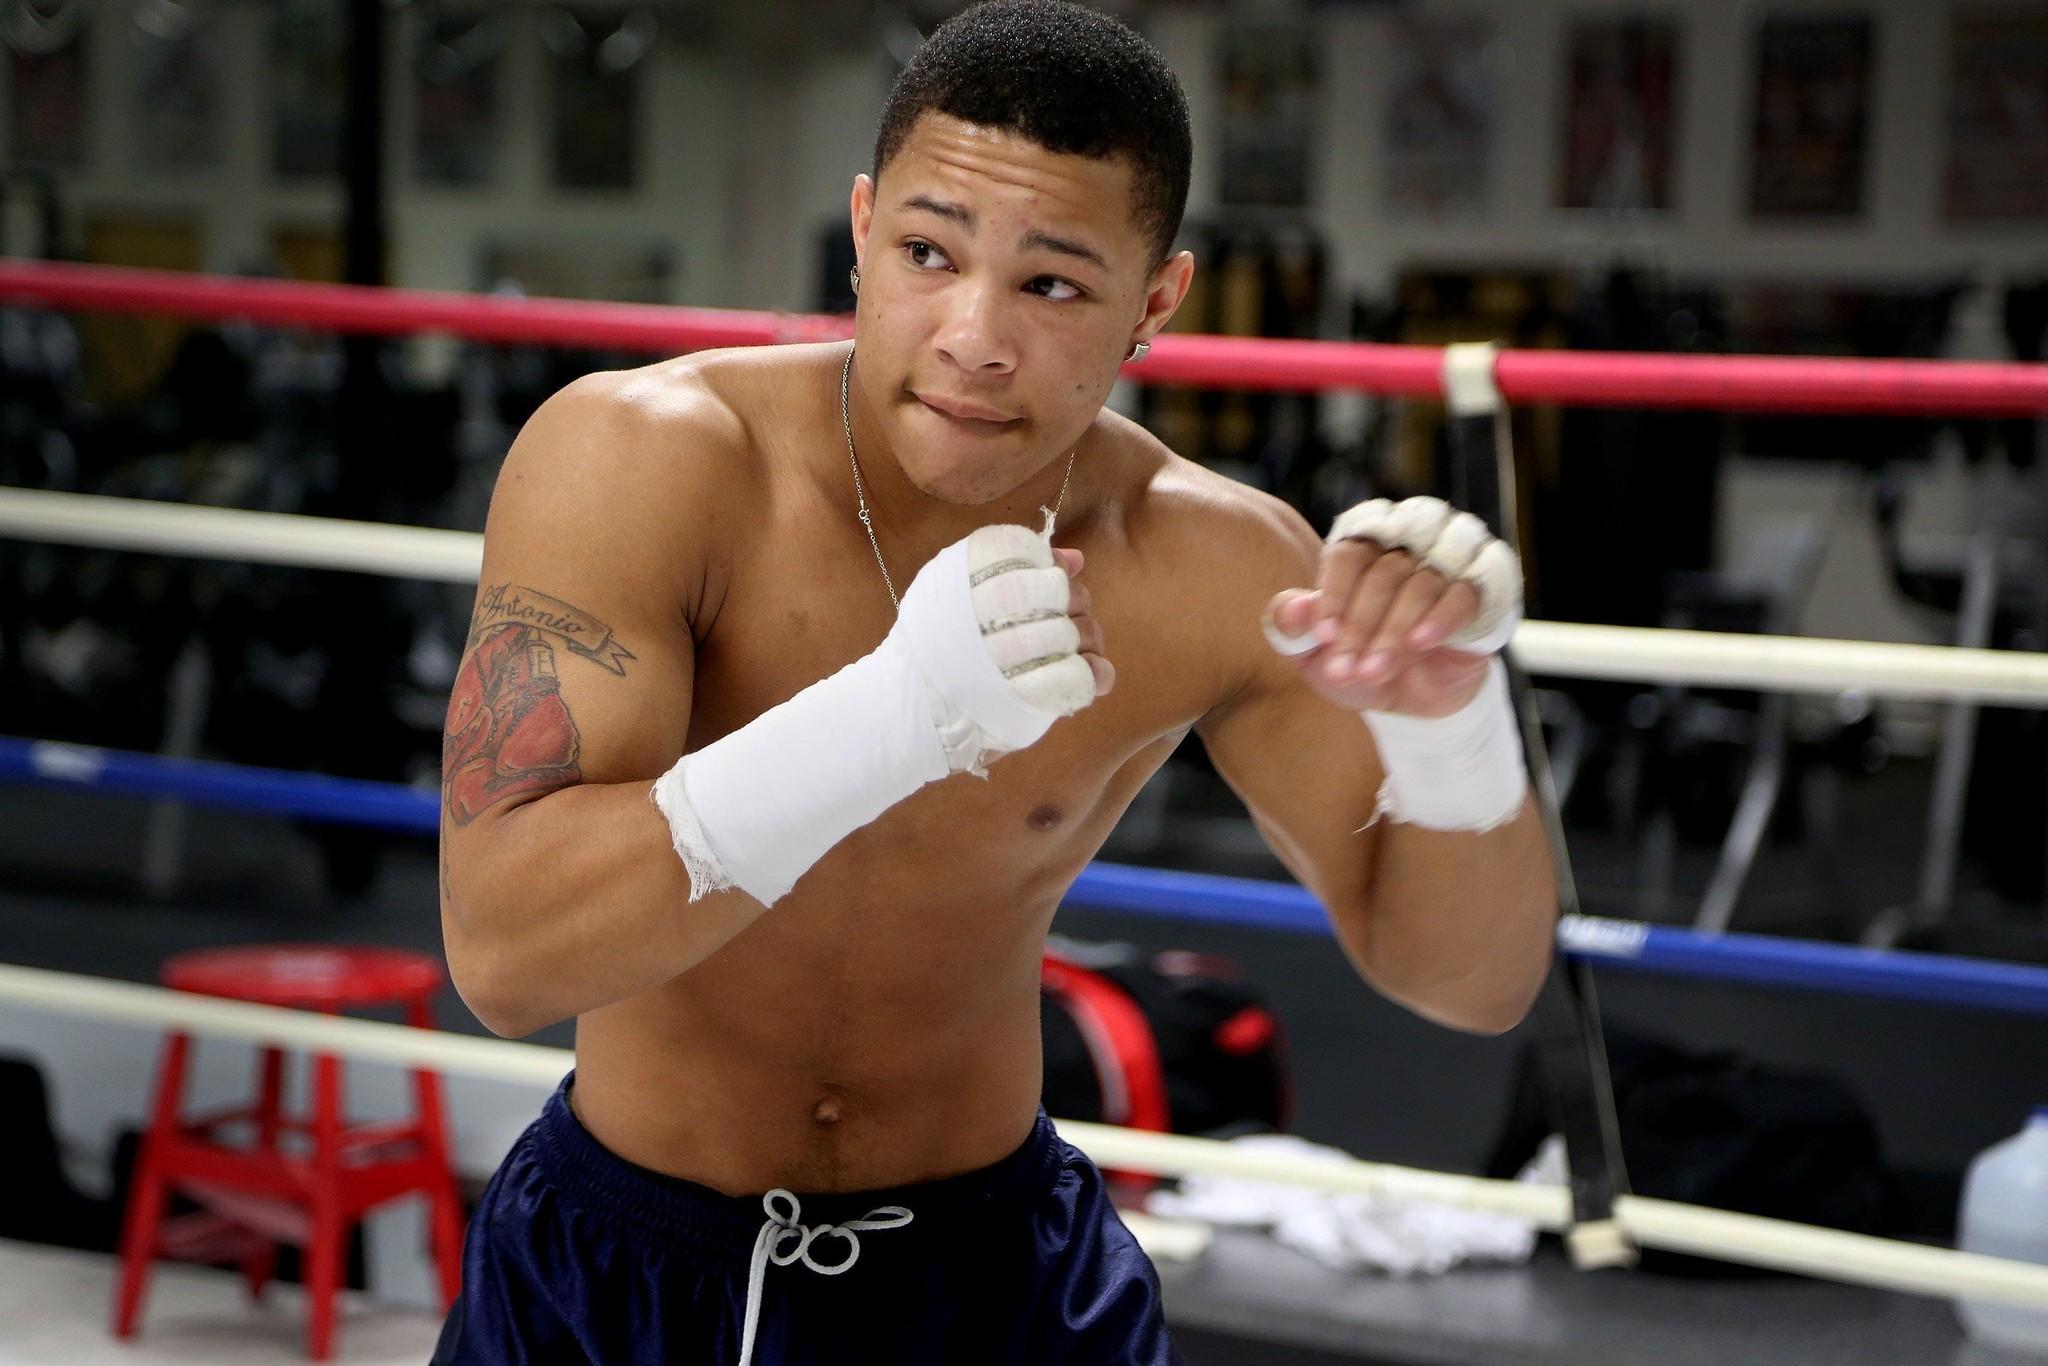 Pound 4 Pound Boxing Gloves